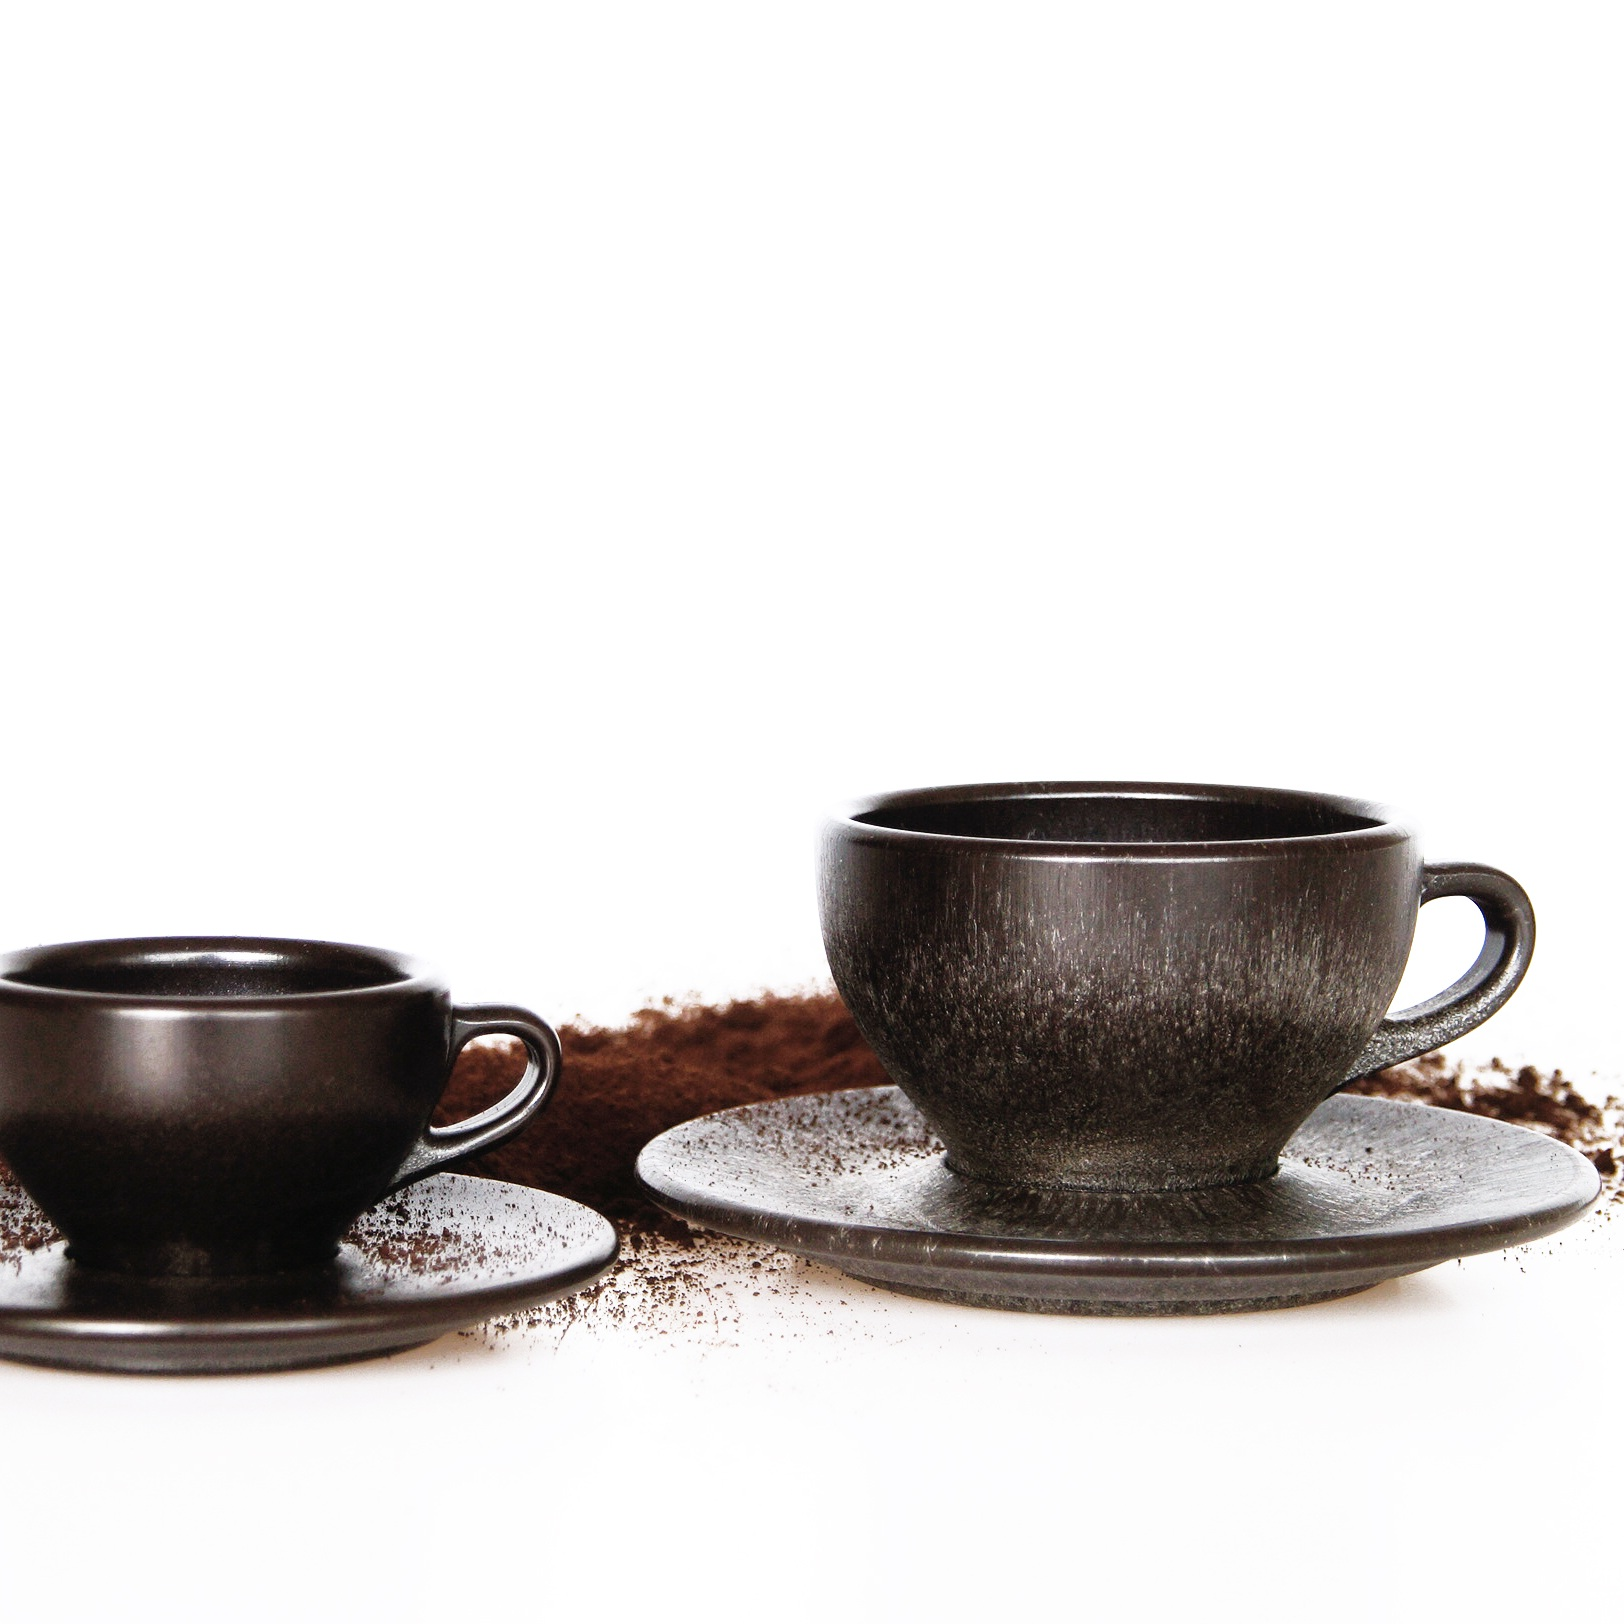 Kaffeeform+espresso+cups%2C+Julian+Lechner+-++2017+%281%29.jpg